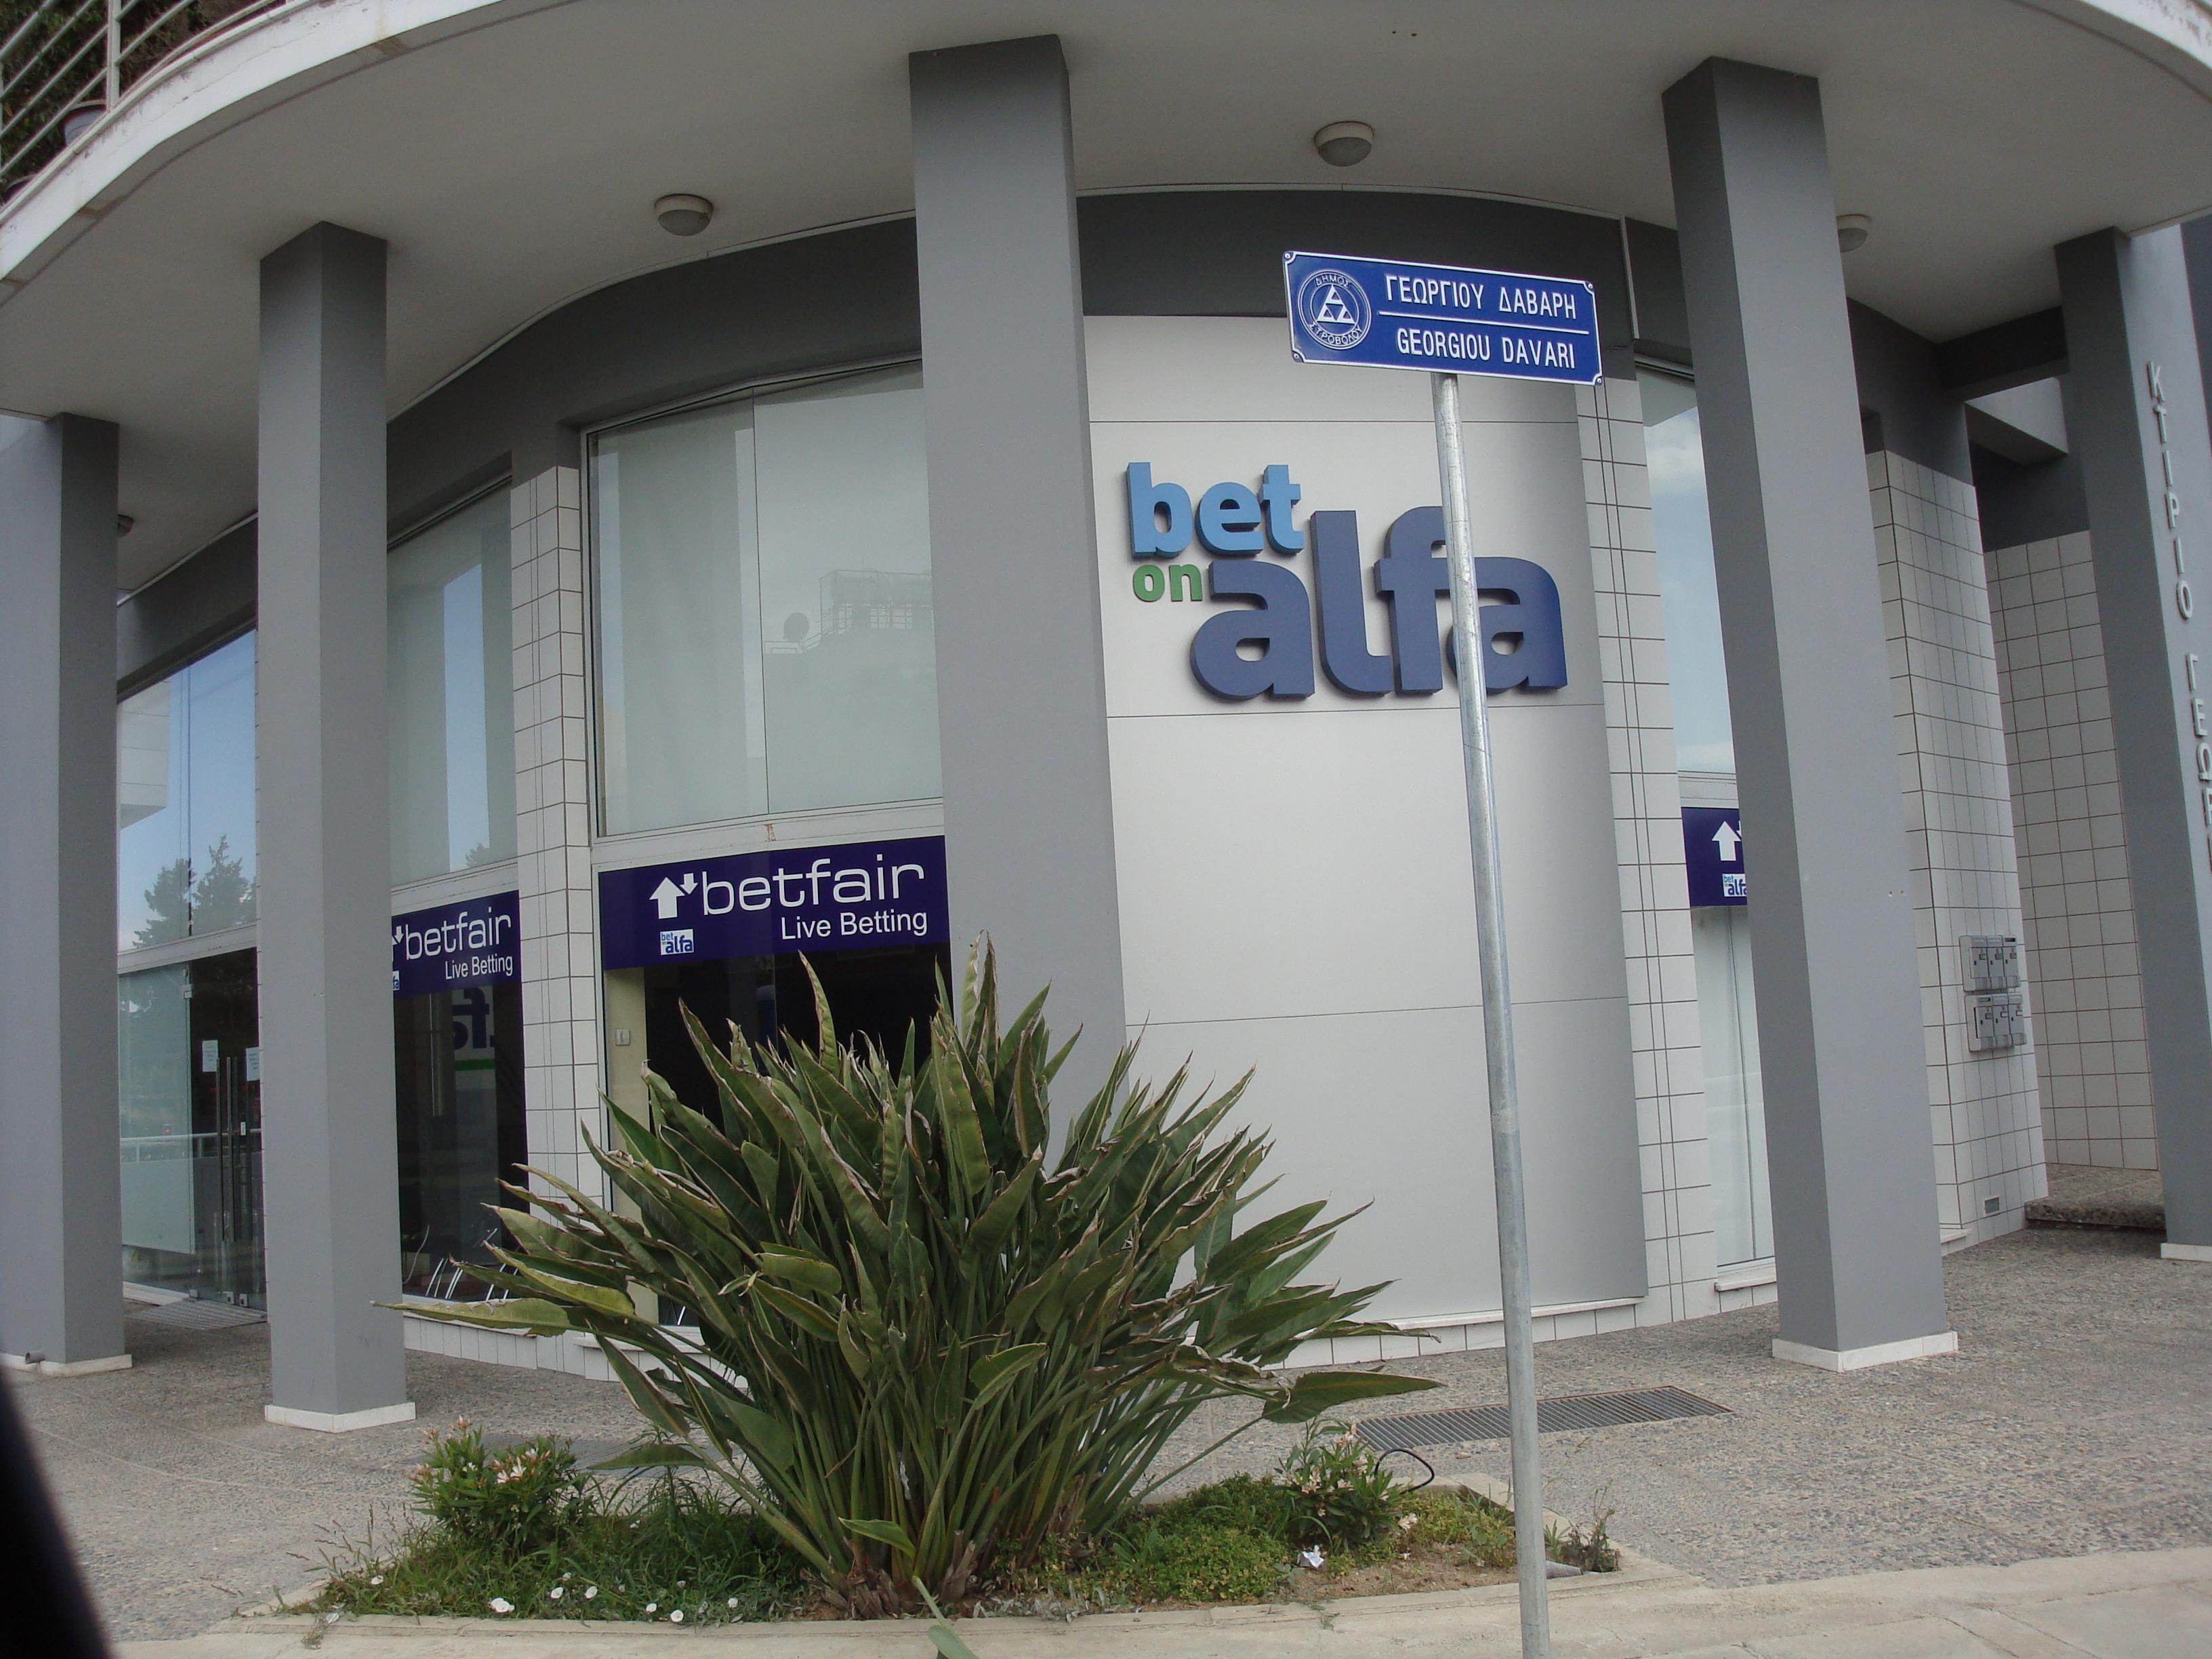 Bet on alfa cyprus shakhtar donetsk vs malmo betting expert nfl